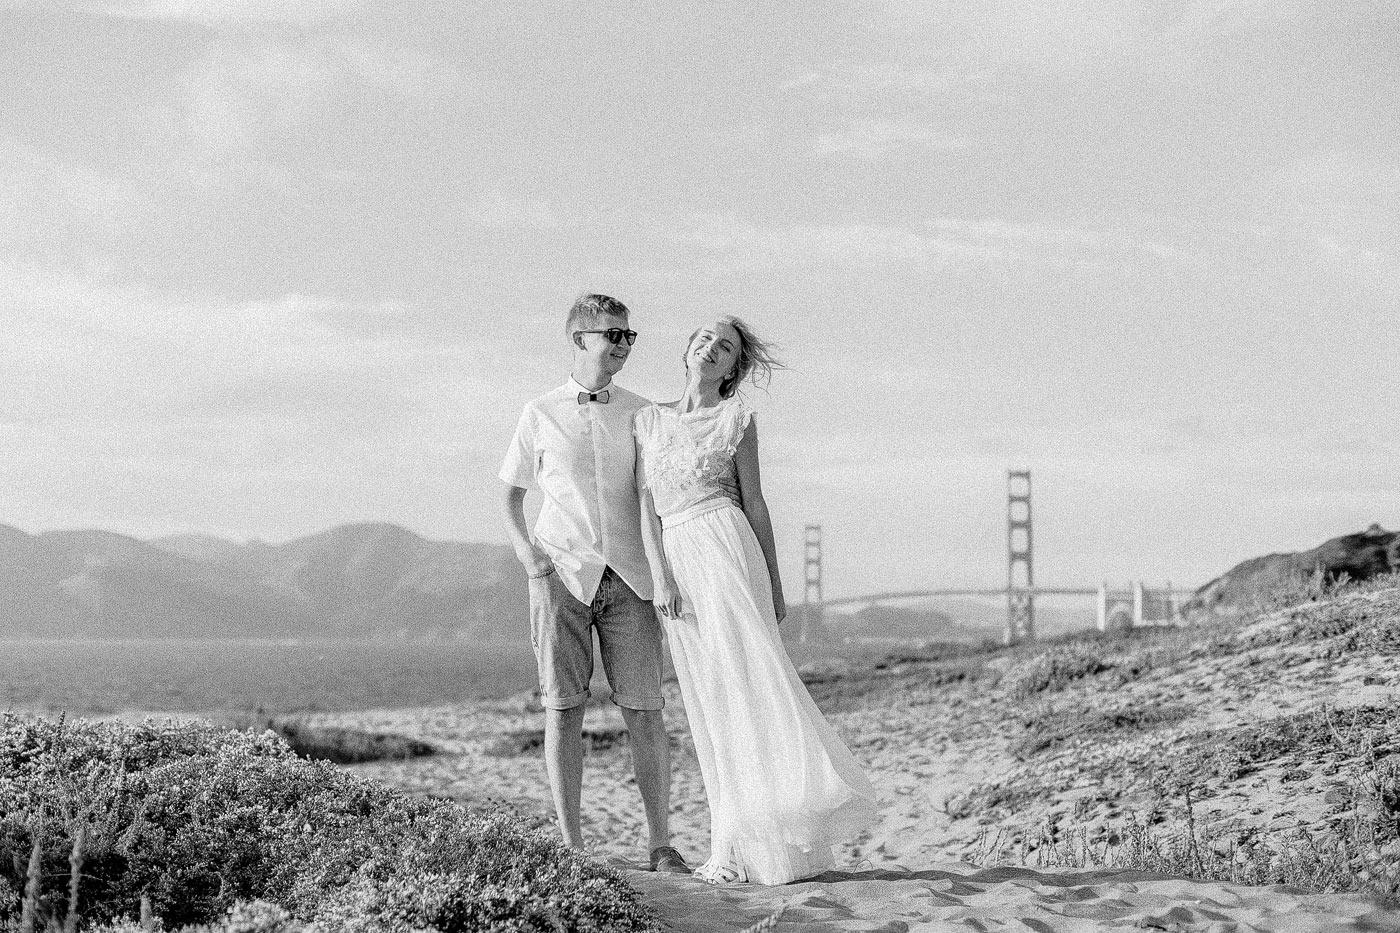 Golden Gate Bridge Engagement Photos